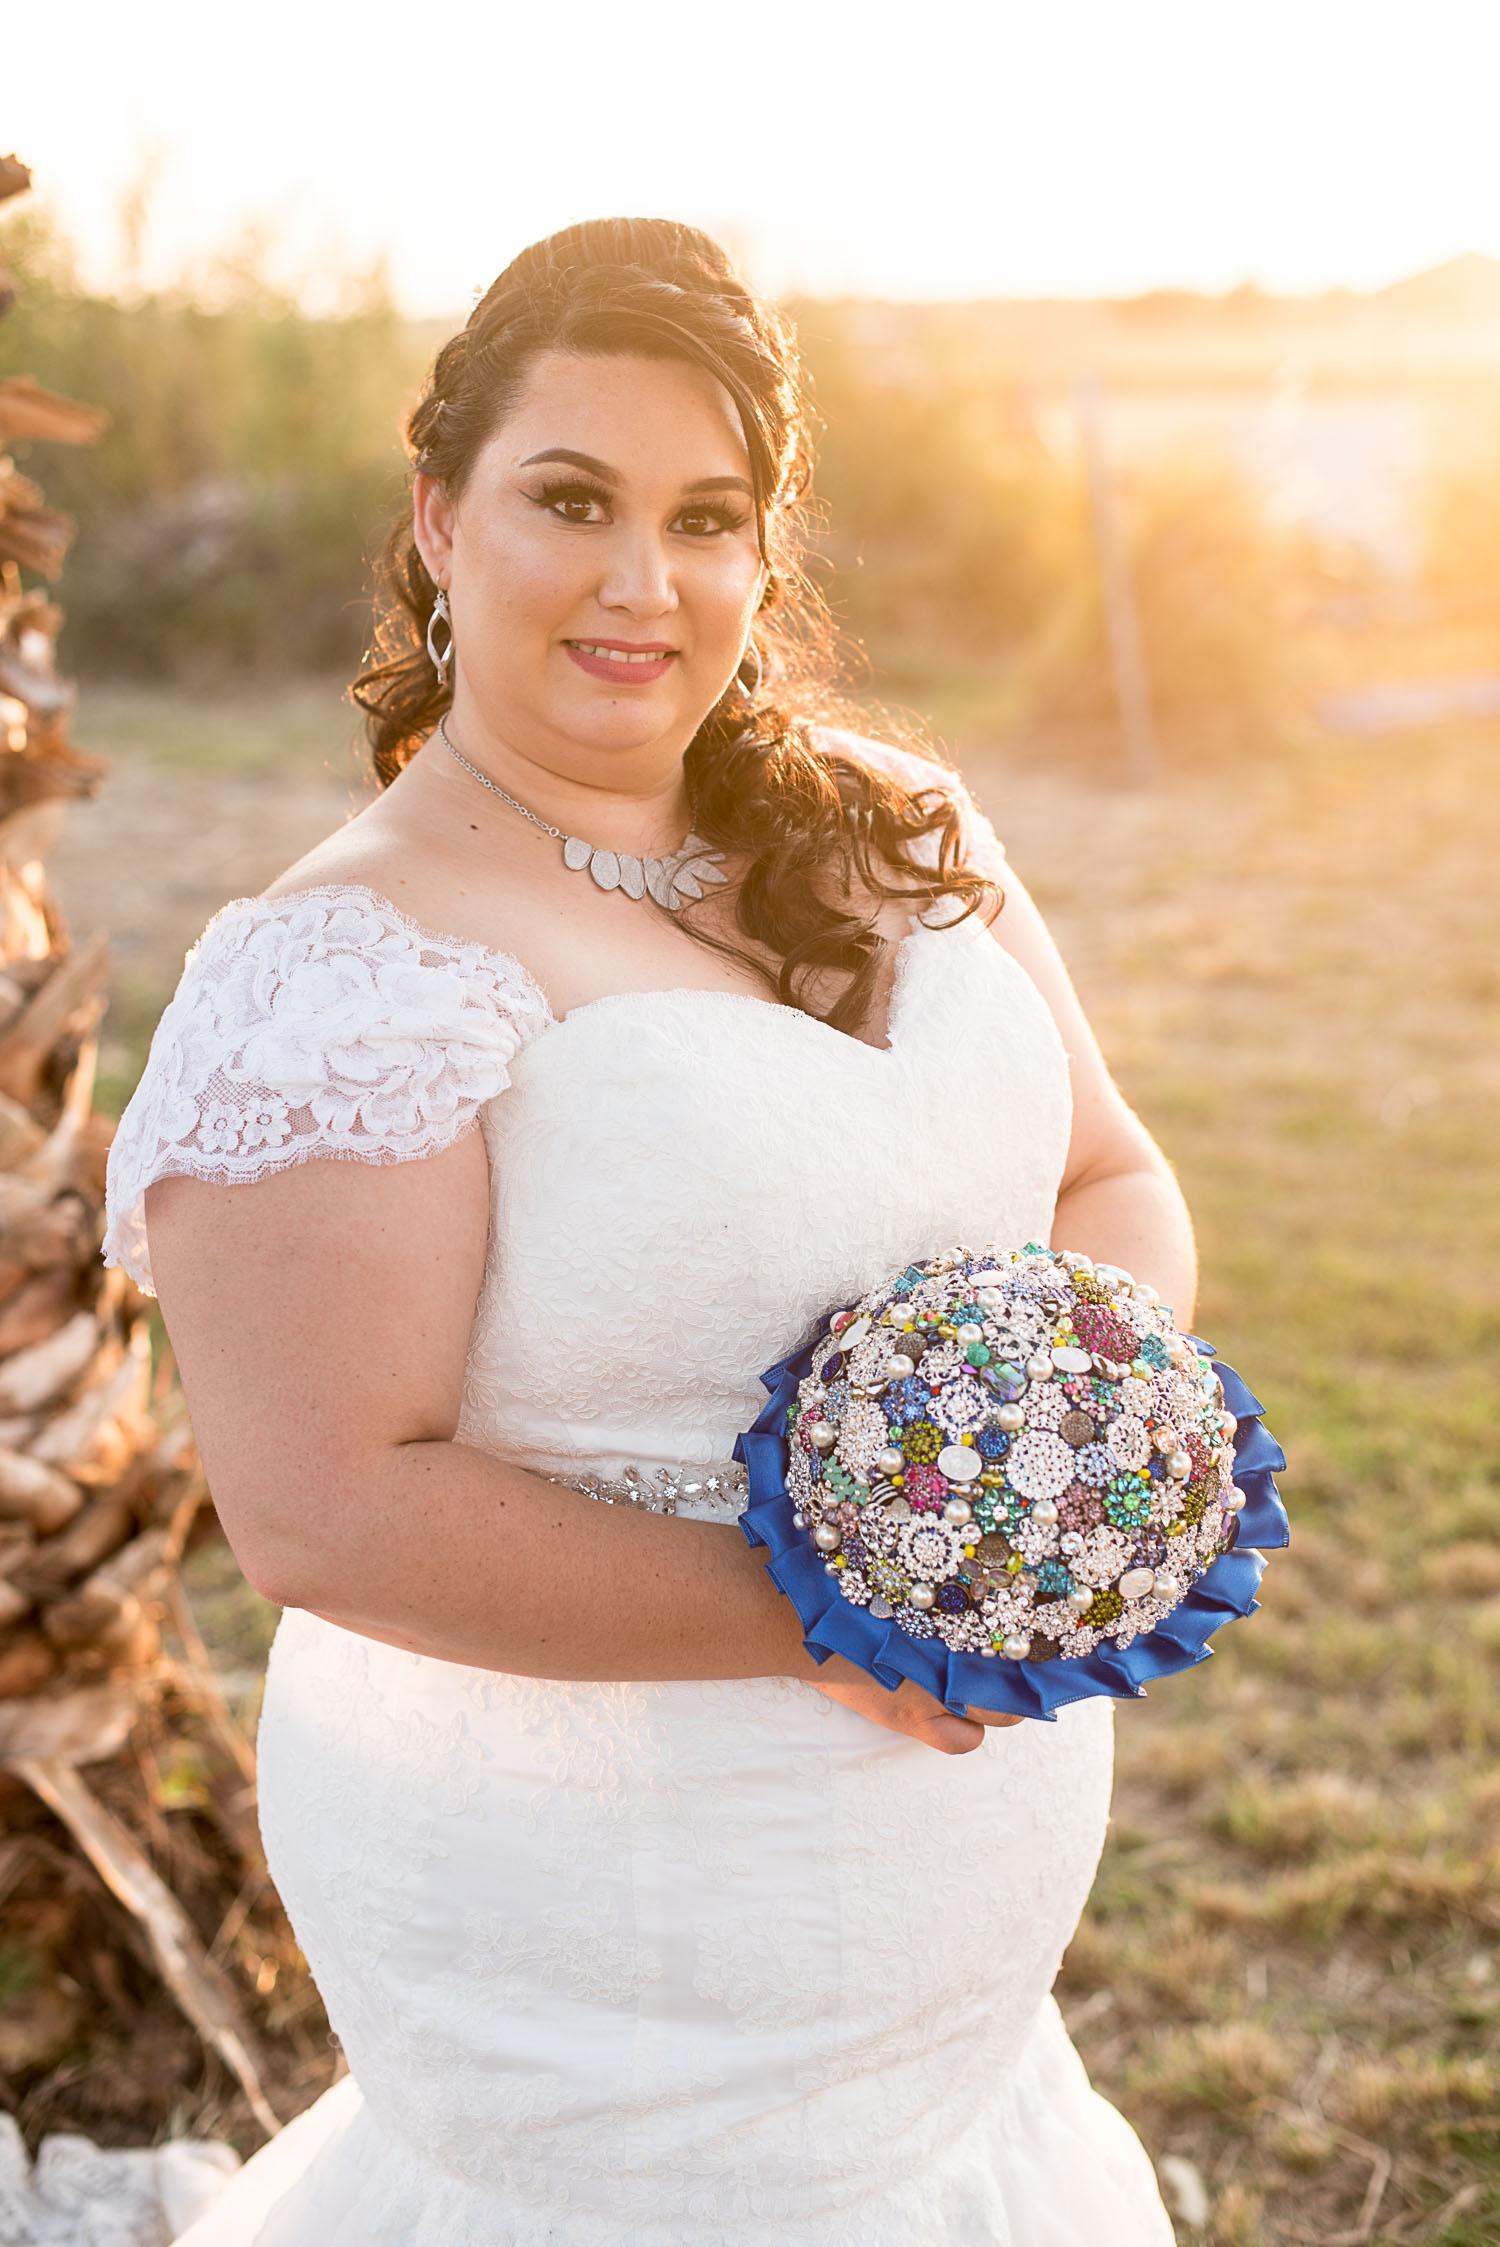 Leal Wedding Mira Visu Photography-130.jpg